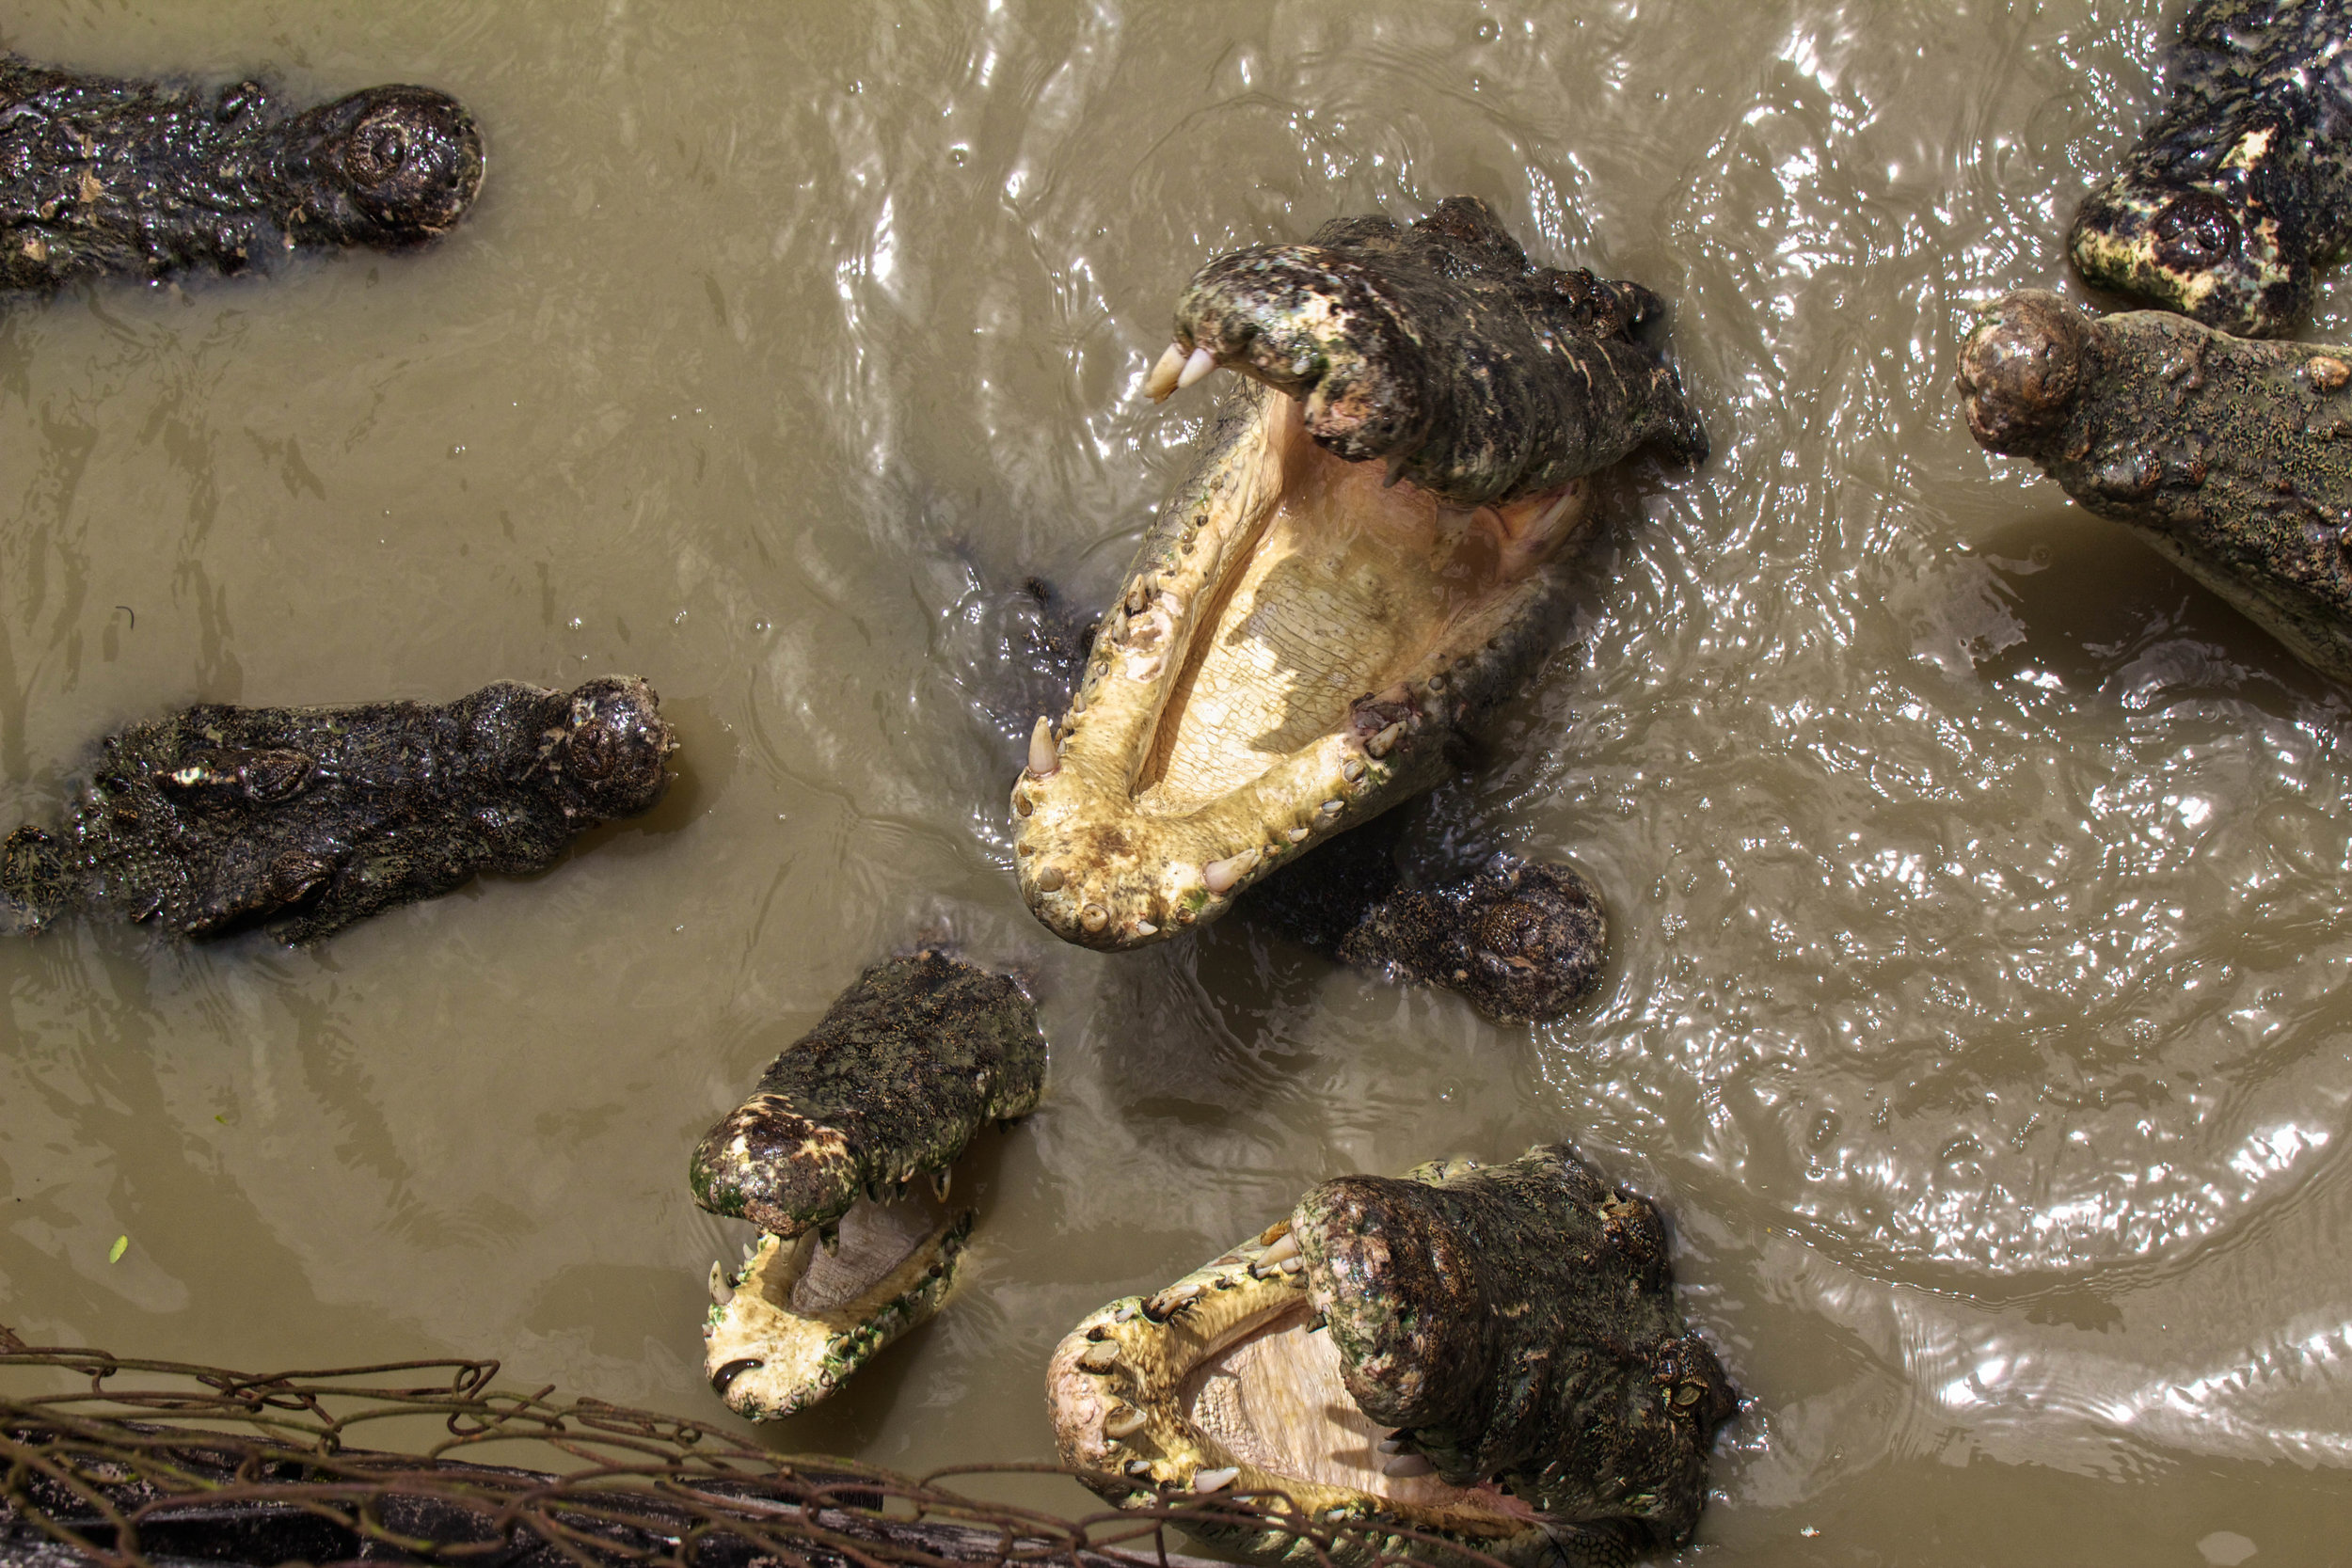 rangoon yangon crocodile farm burma myanmar 4-2.jpg